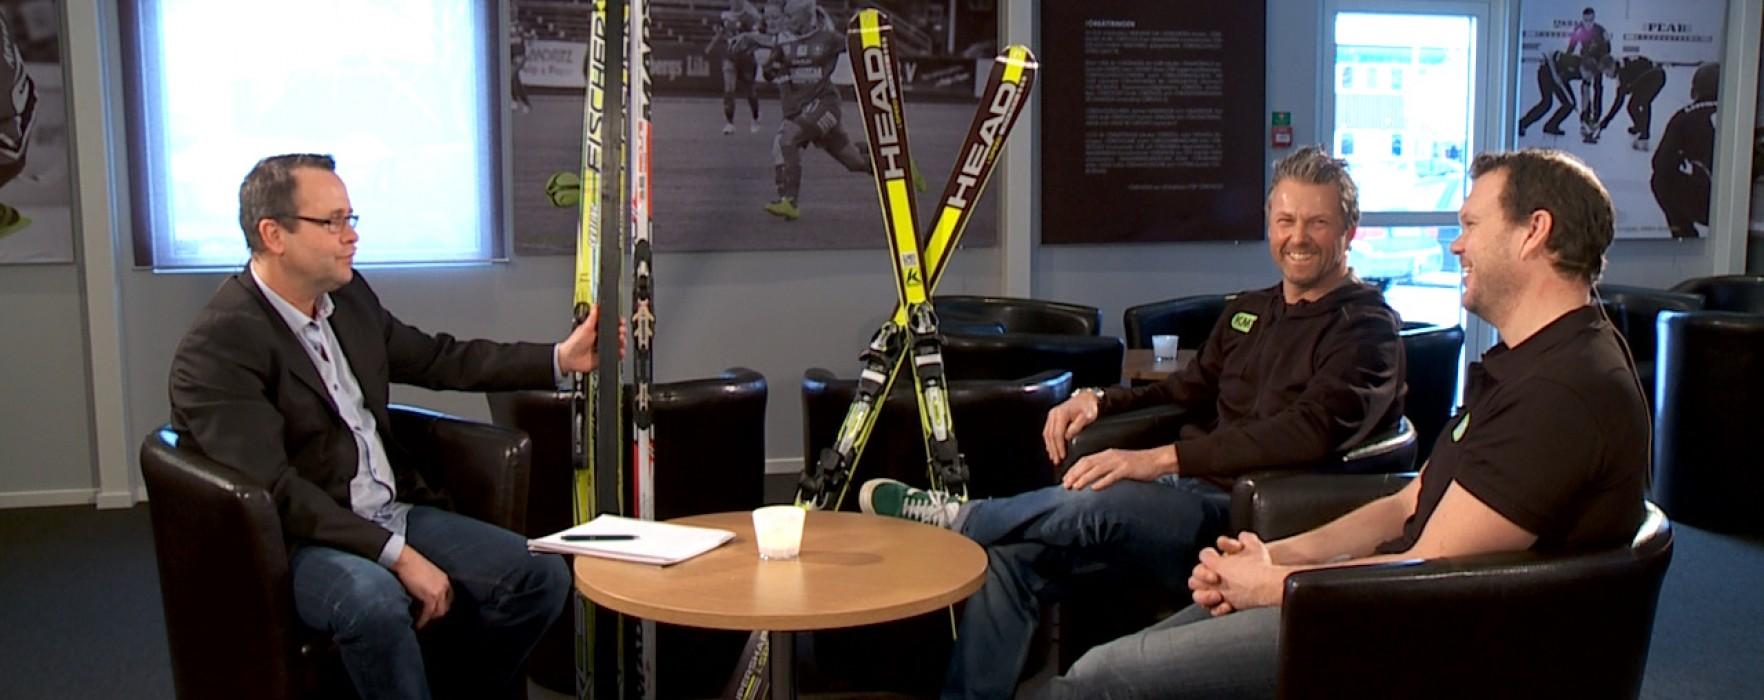 Glimt Sport – Mika Gustafsson och Thobias Fredriksson